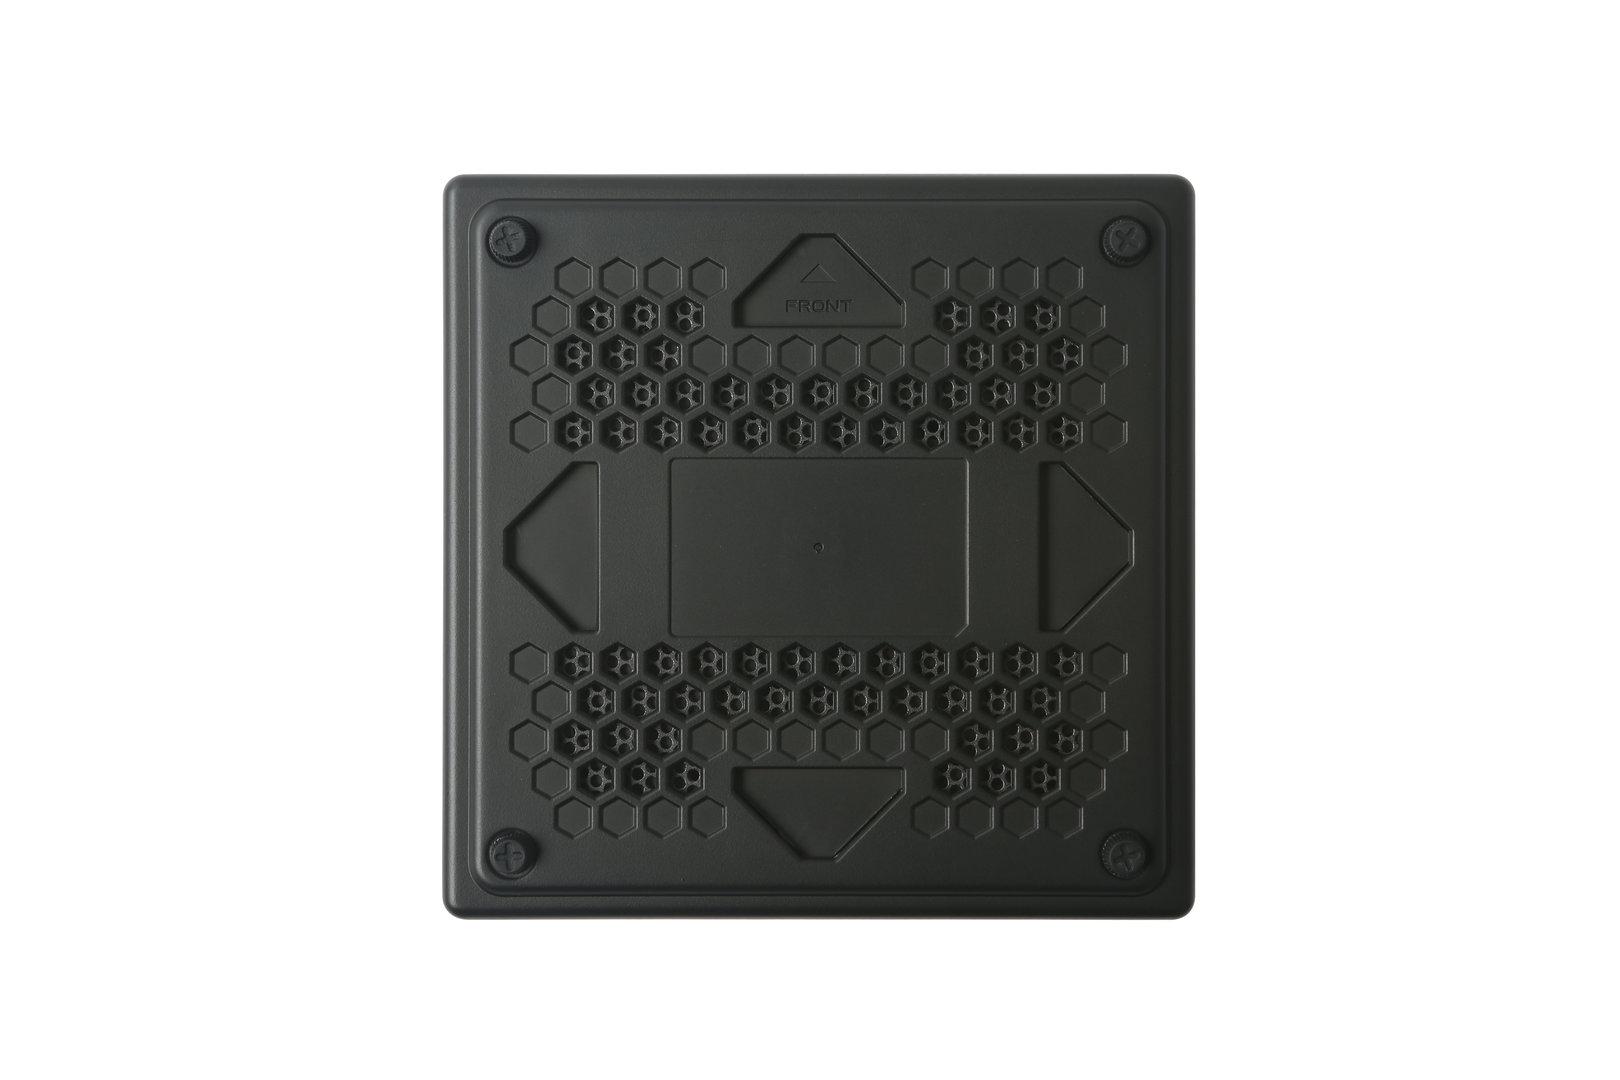 Zbox CI323 nano